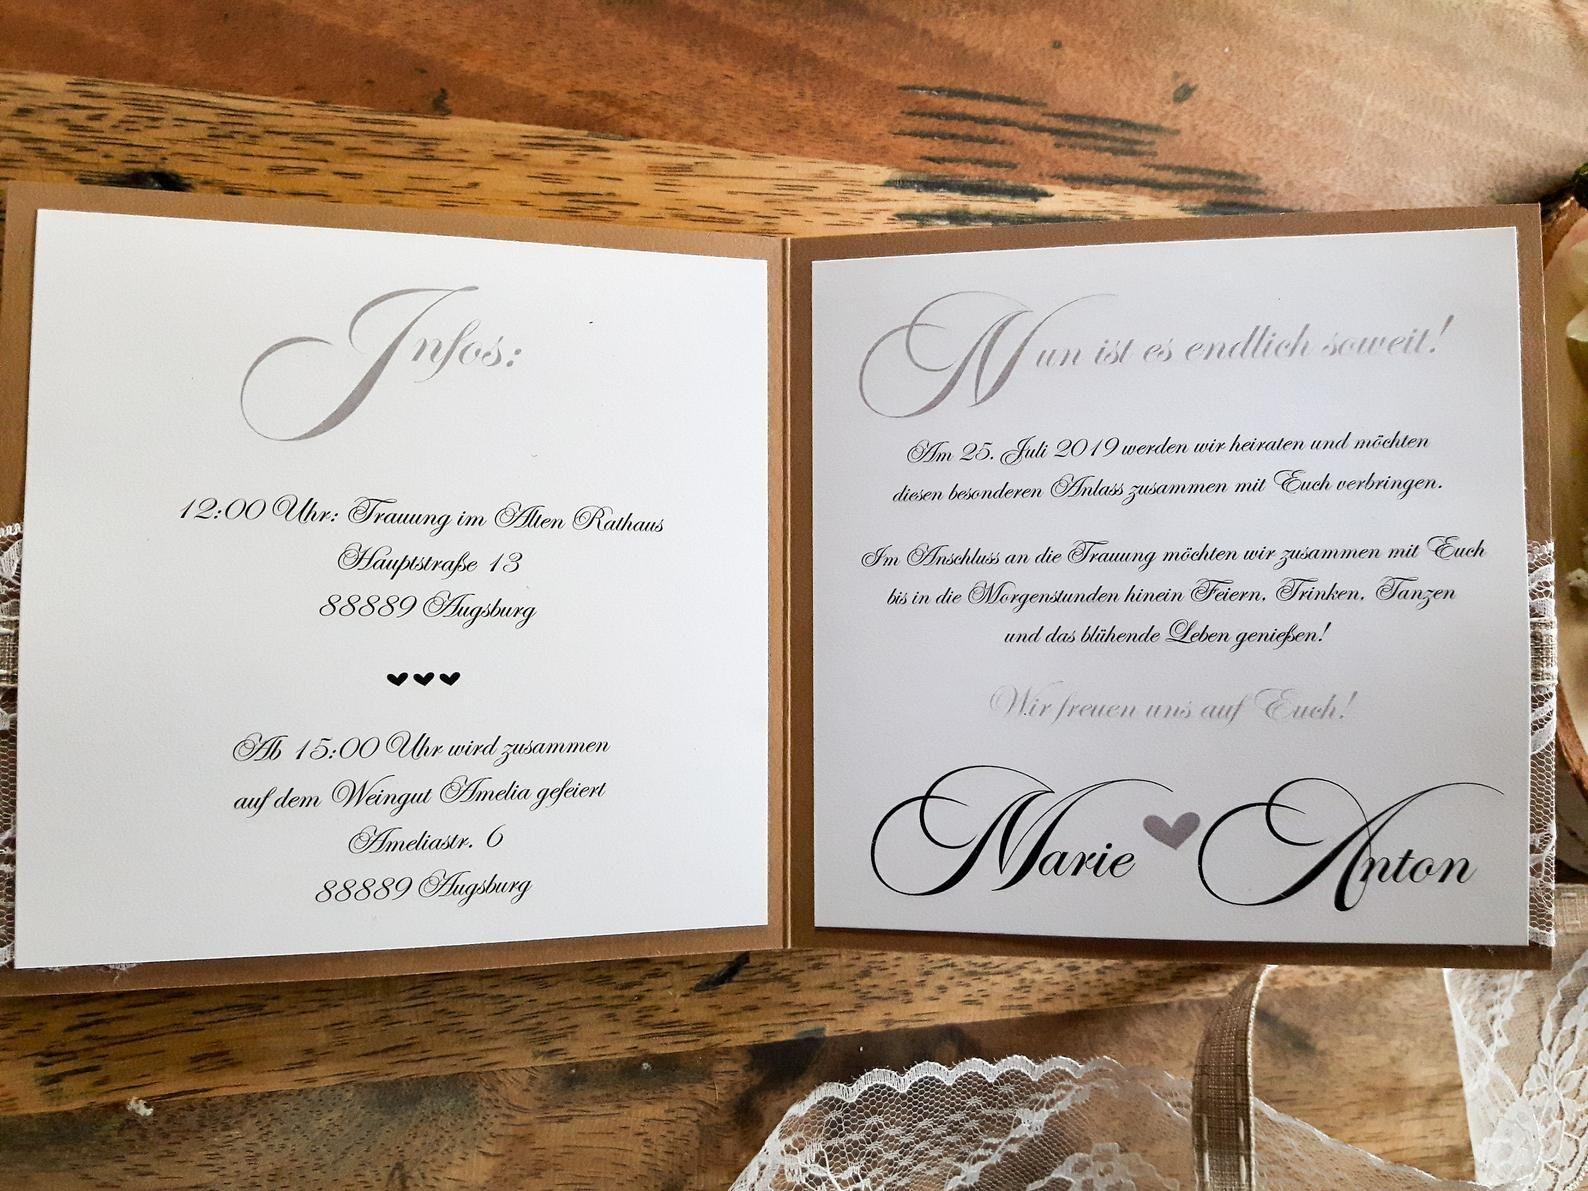 Wedding Invitation Vintage Wedding Invitation Invitation Card Wedding Cards Wedding Papeterie Boho Lace Kraft Paper Dream In 2020 Wedding Invitation Cards Wedding Cards Vintage Wedding Invitations